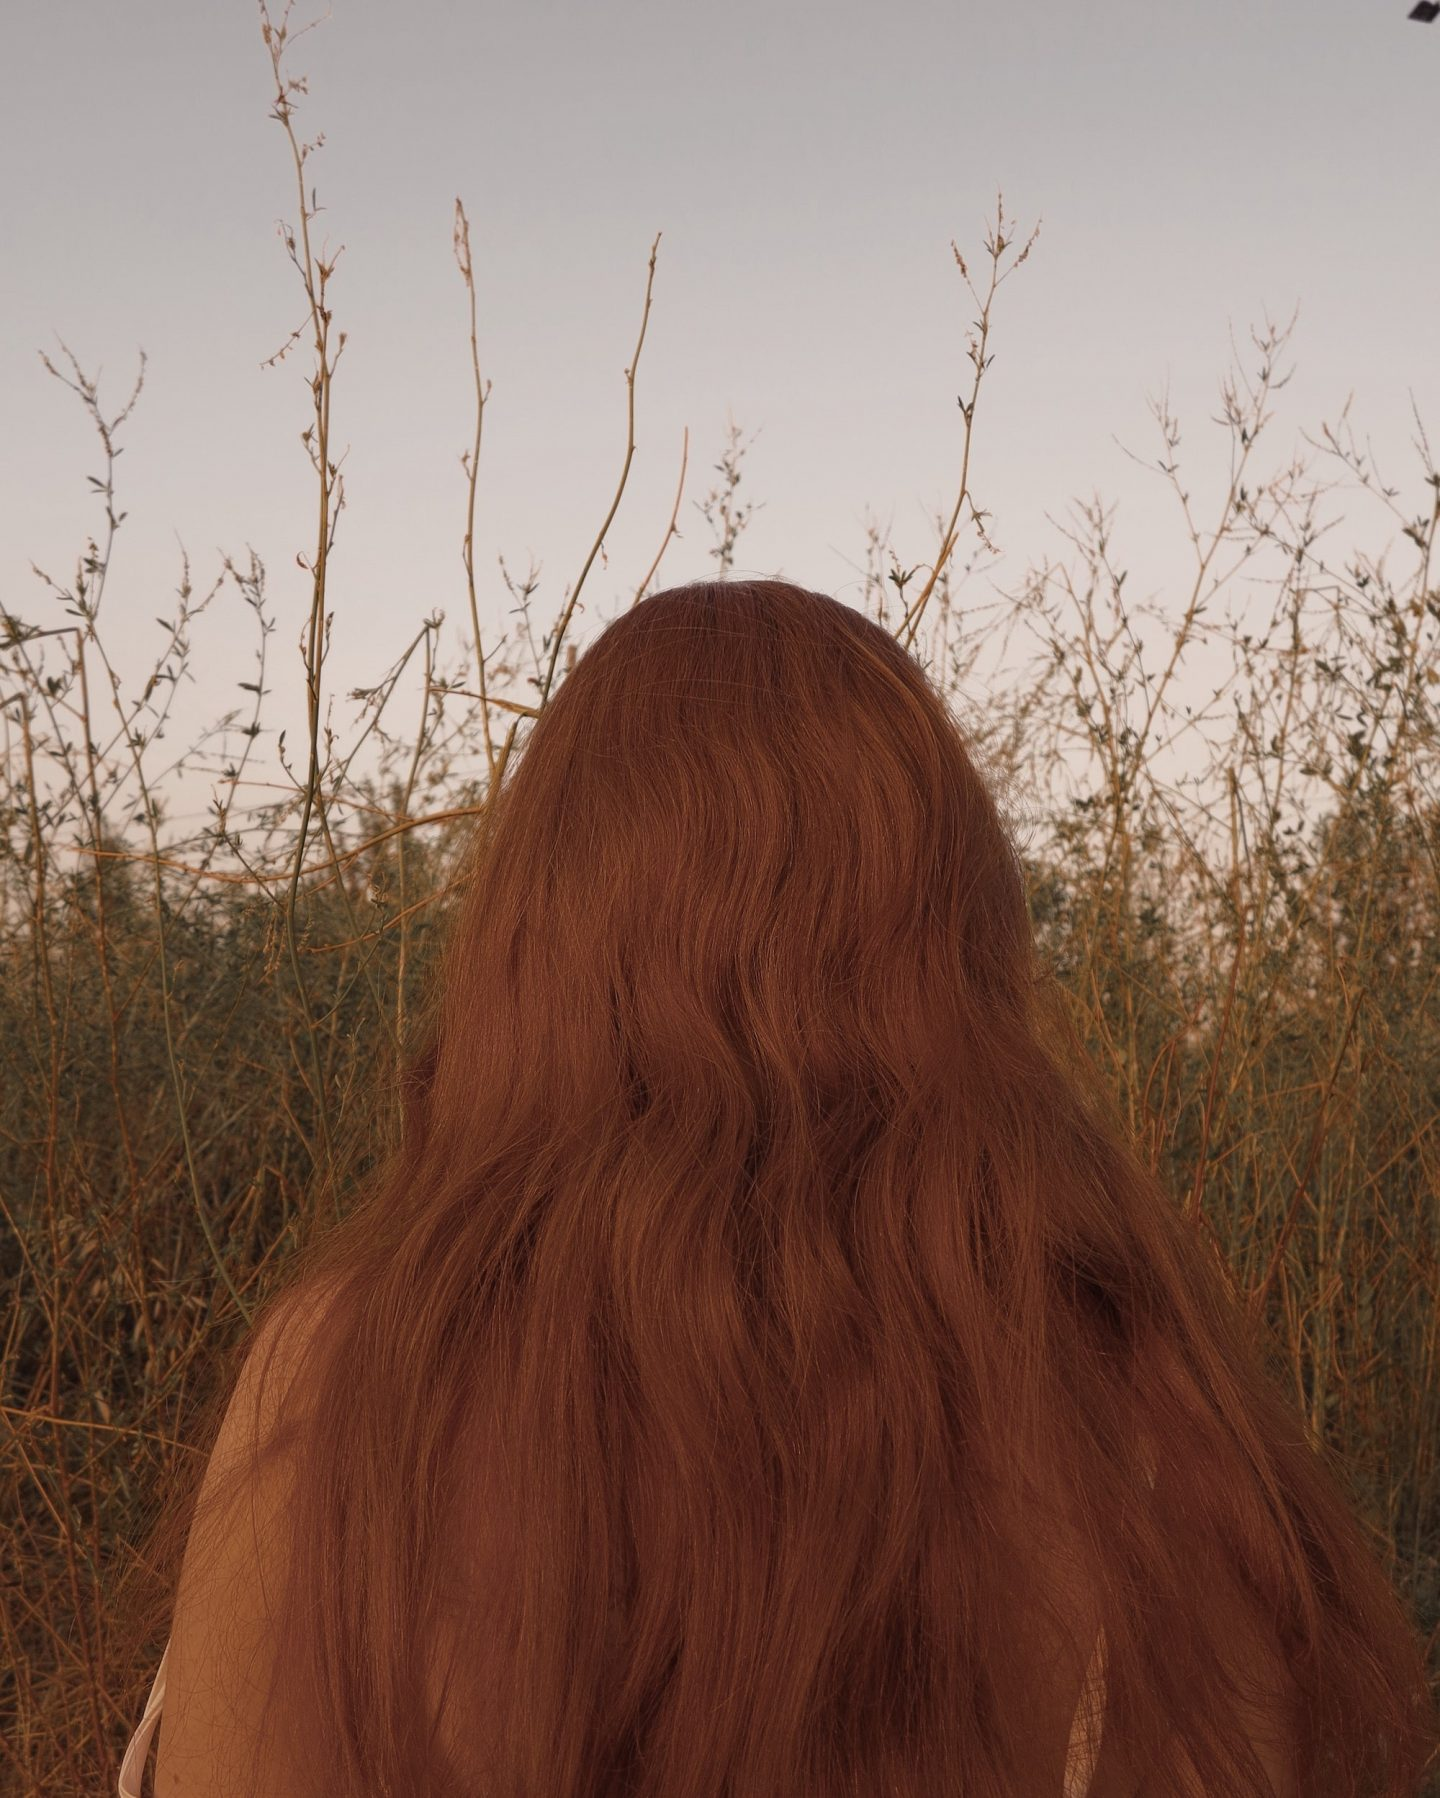 IGNANT-Photography-Alessia-Morellini-01-min